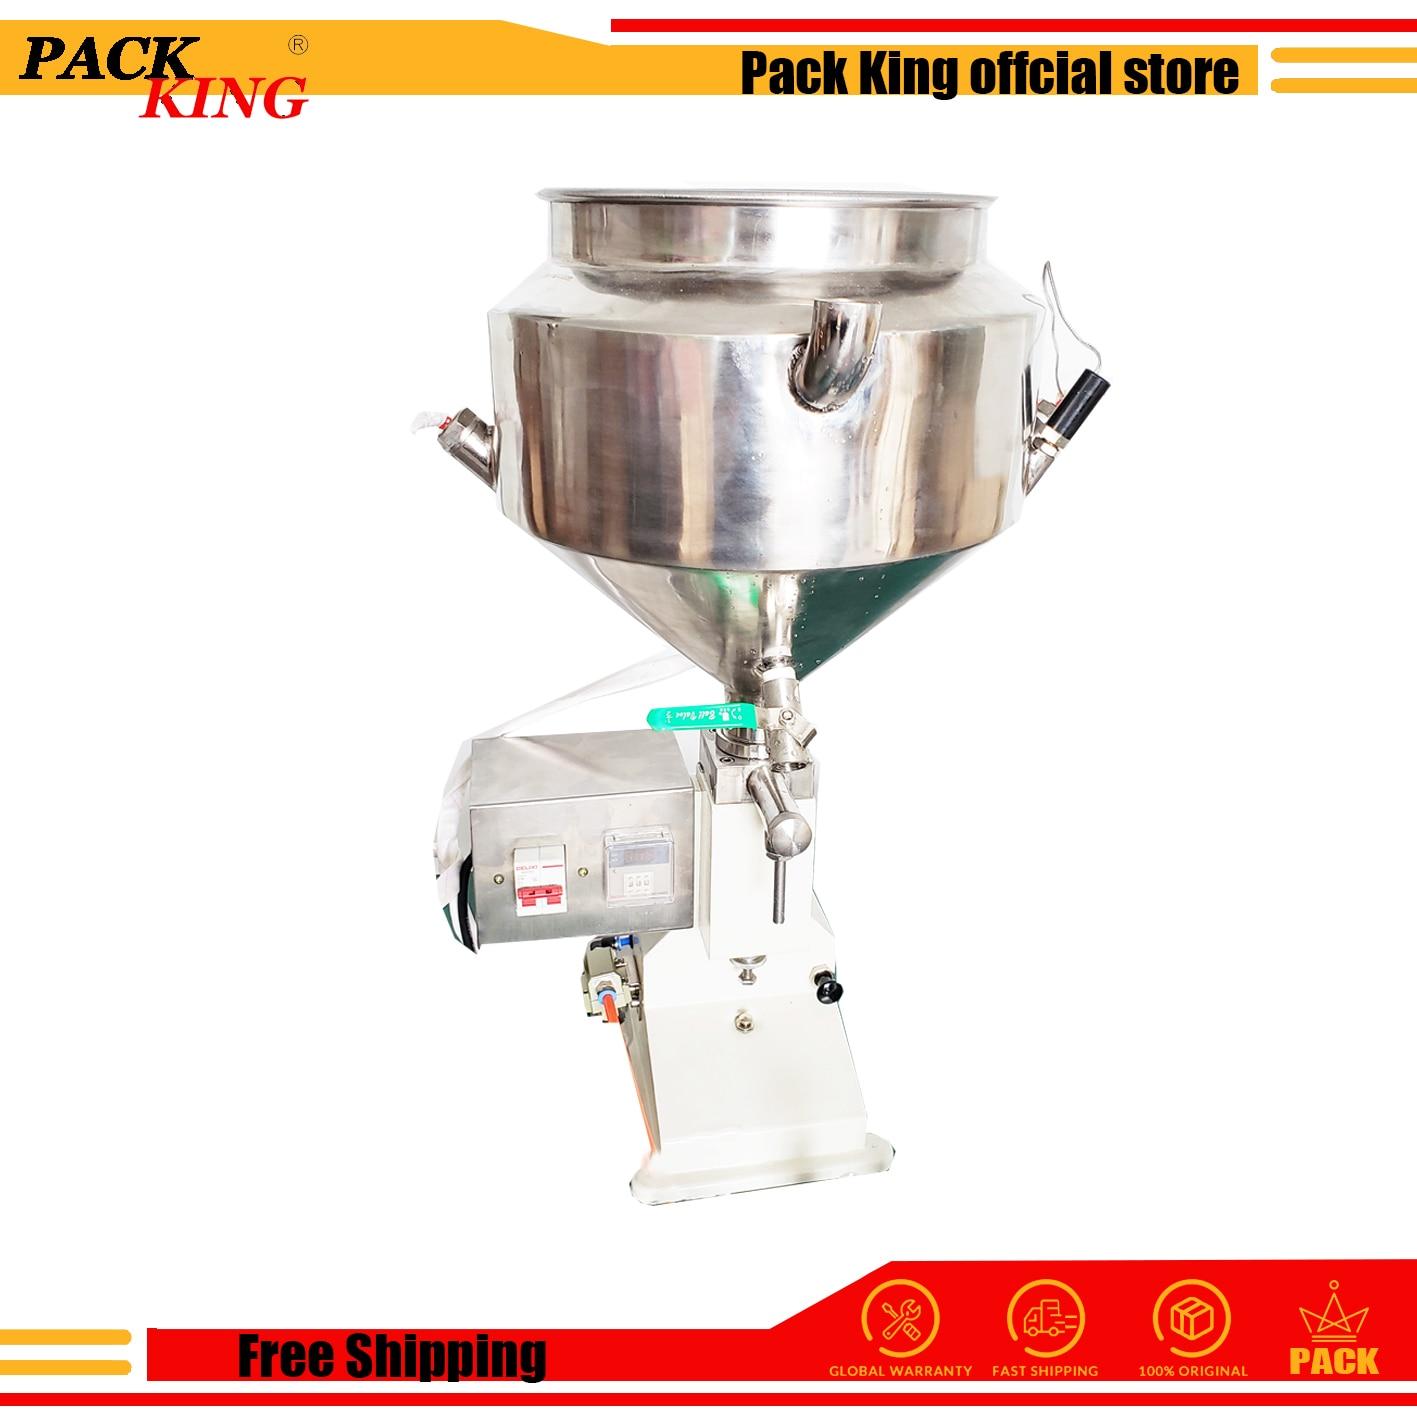 Heating Hopper Pneumatic Filling Machine 5-50ml Cream Food Paste Dispensing Peanut Butter Packaging Equipment Free Shipping